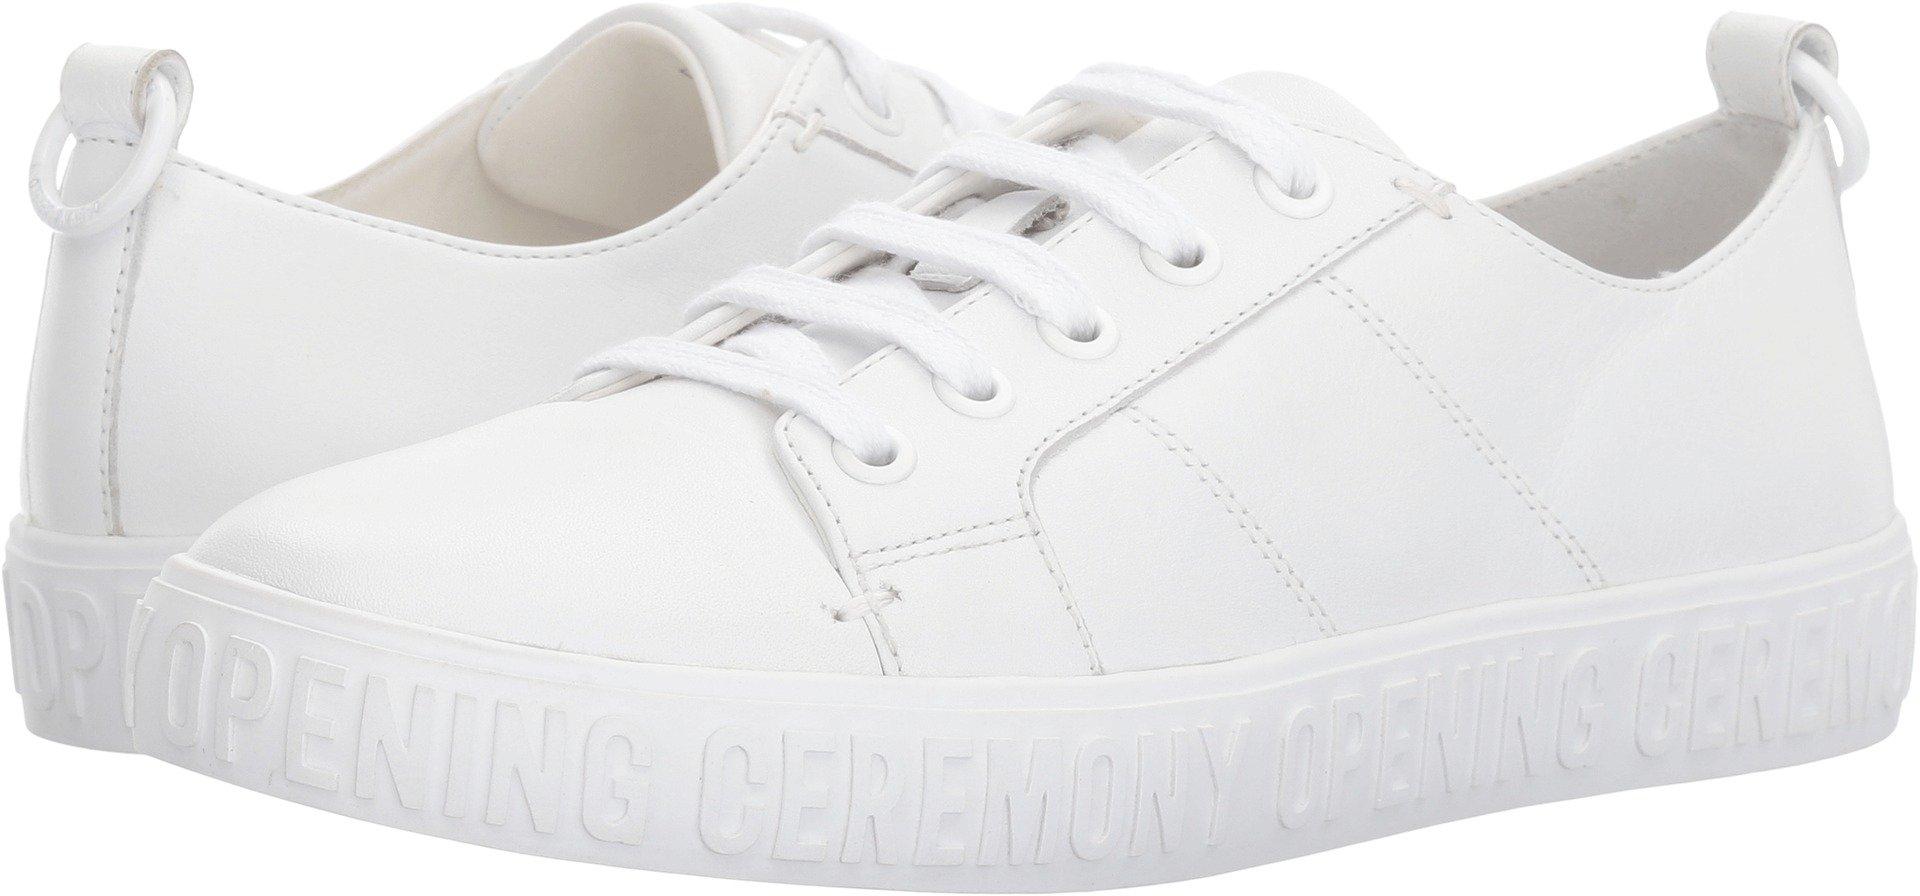 Opening Ceremony Women's La Cienega Low Top Sneaker White Oxford